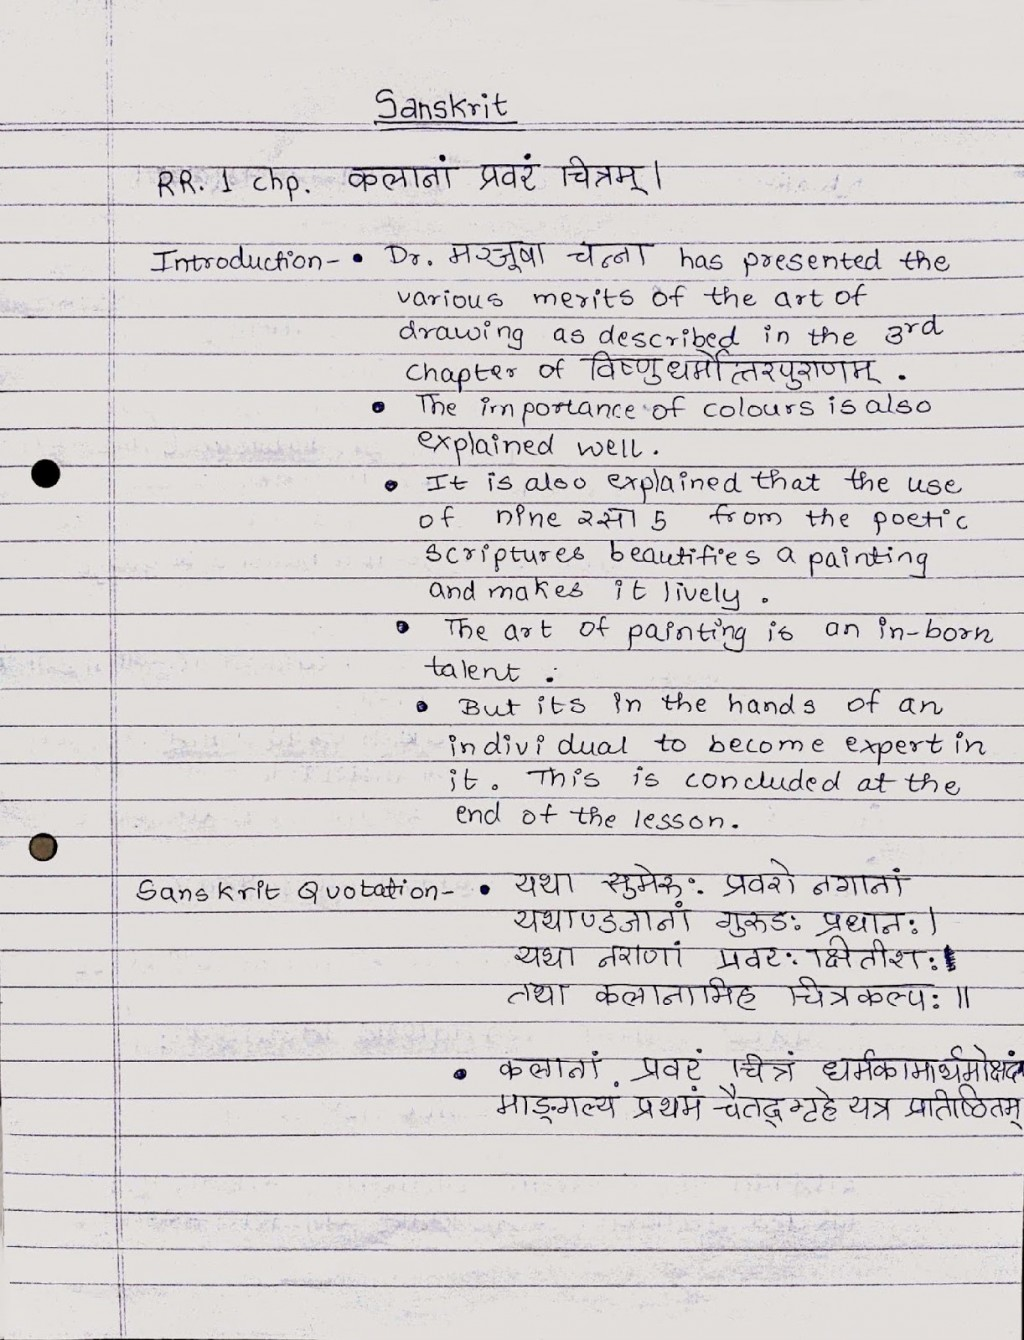 013 Description Of Trees For Essays Essay Example Sanskrit Quotes Poemrr1 Page Striking Large